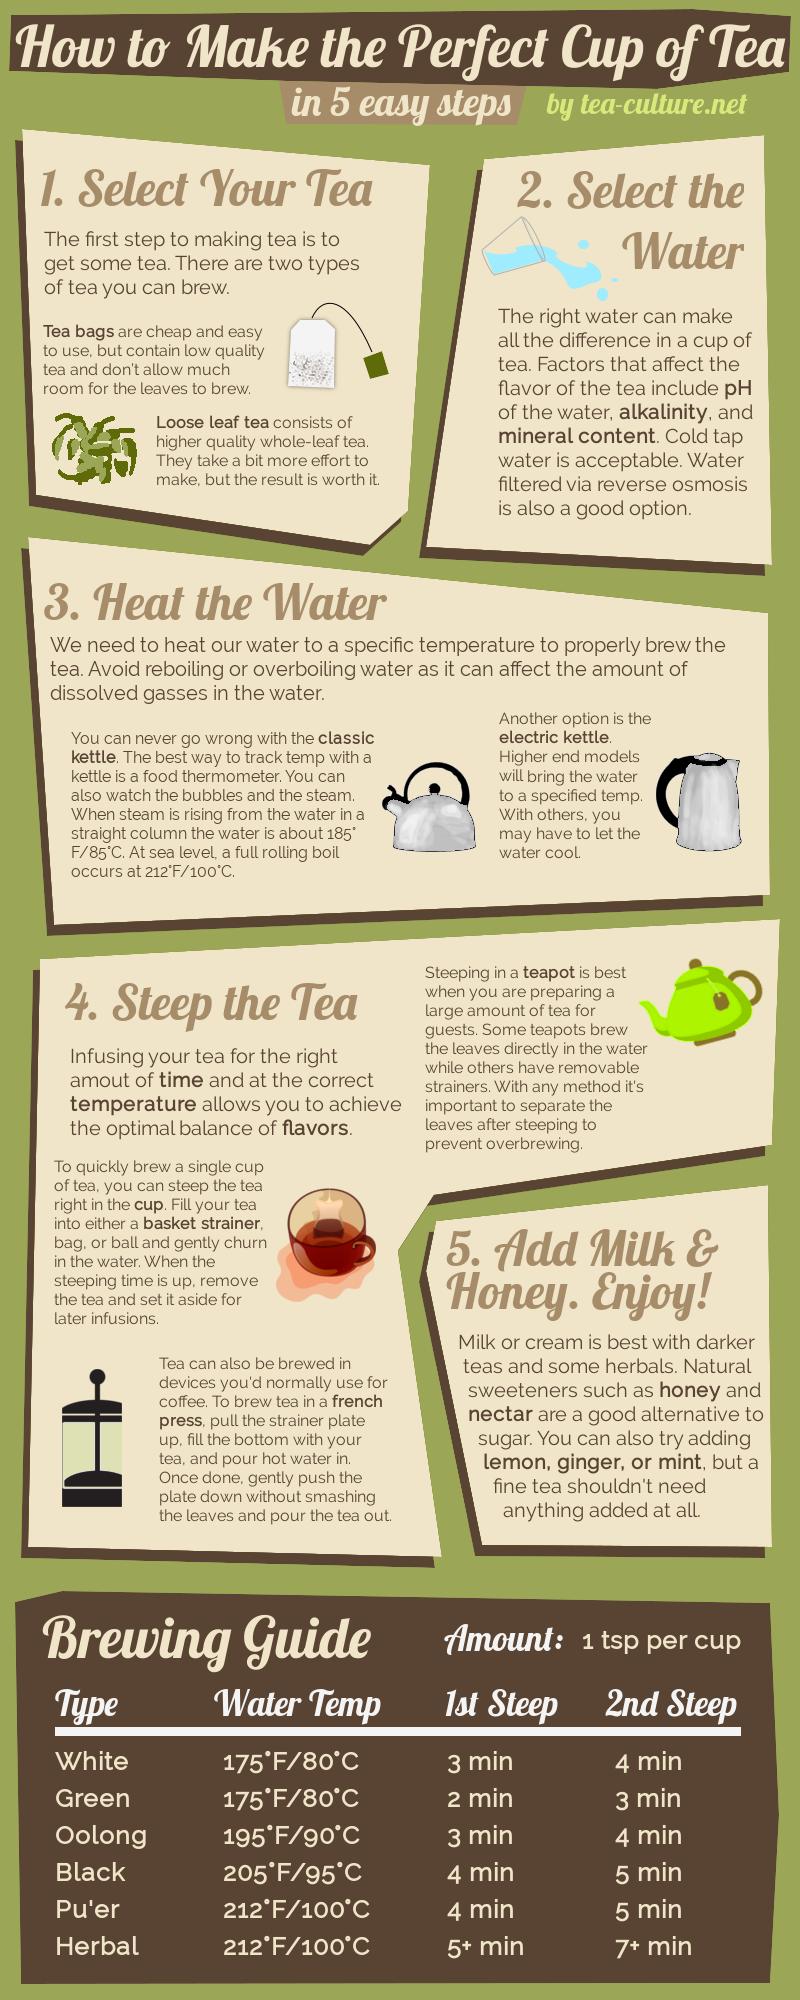 How to brew tea infographic